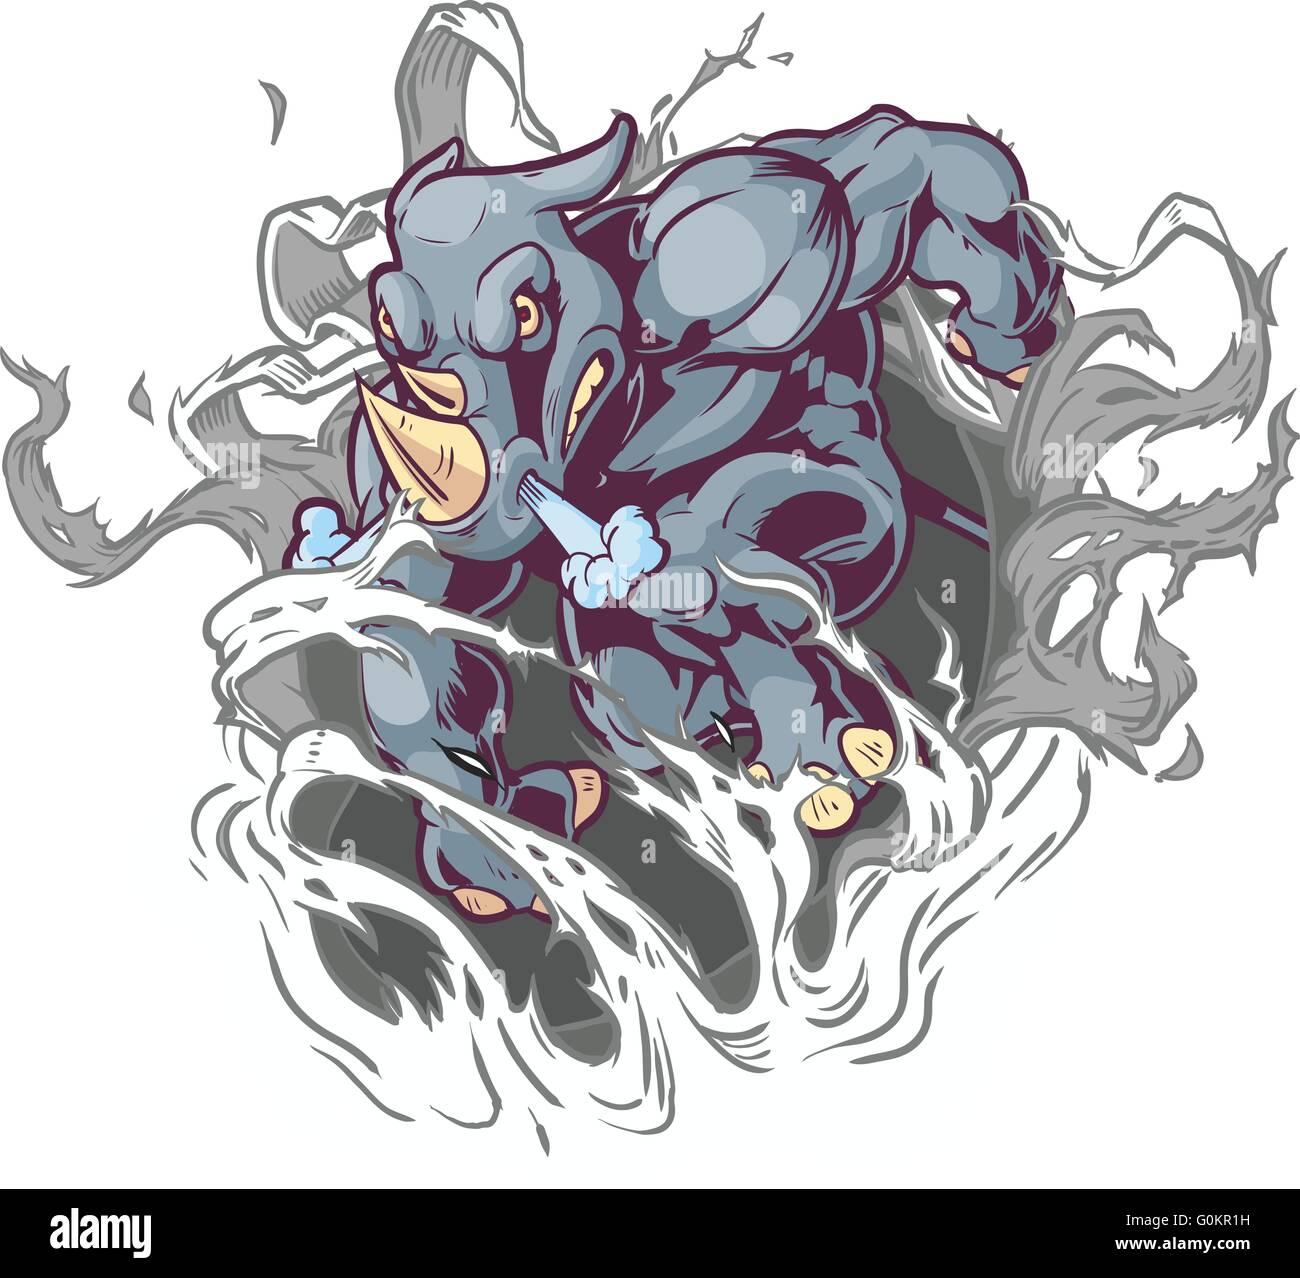 Vector Cartoon Clip Art Illustration of a Crouching Anthropomorphic Cartoon Mascot Rhino Ripping Through the Background. - Stock Image